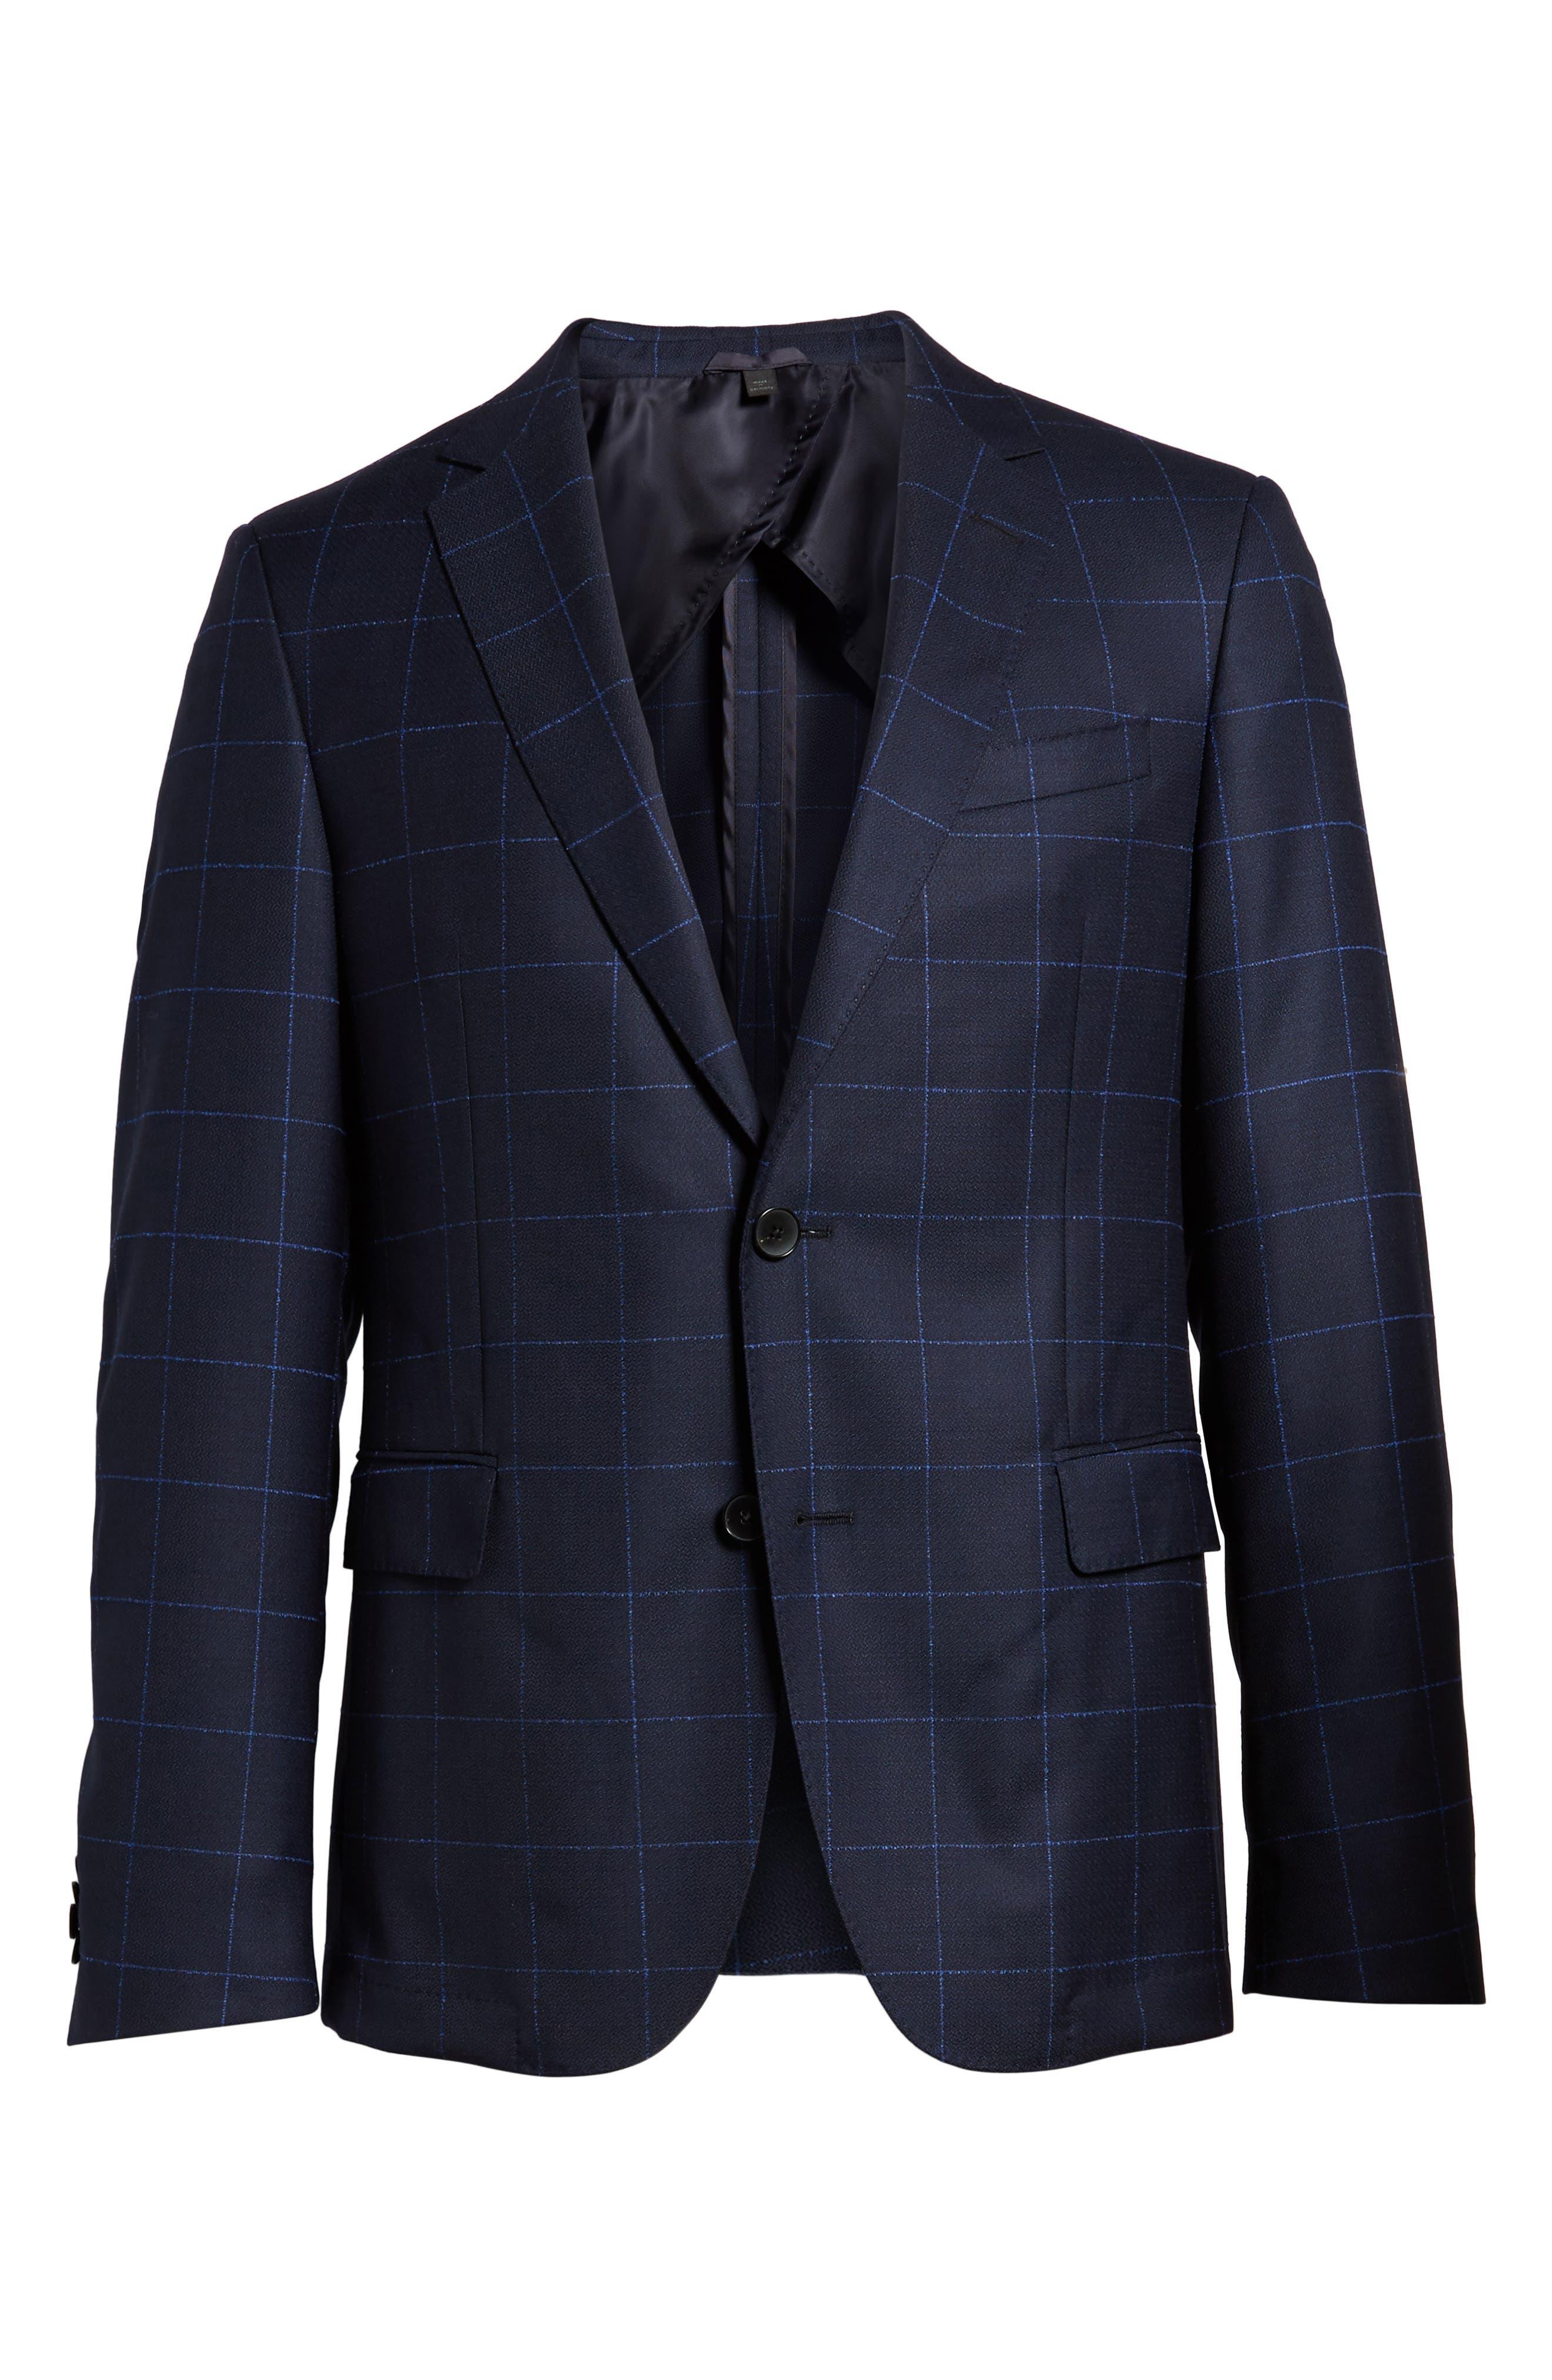 Nordstrom x BOSS Nobis Trim Fit Check Wool Sport Coat,                             Alternate thumbnail 5, color,                             410